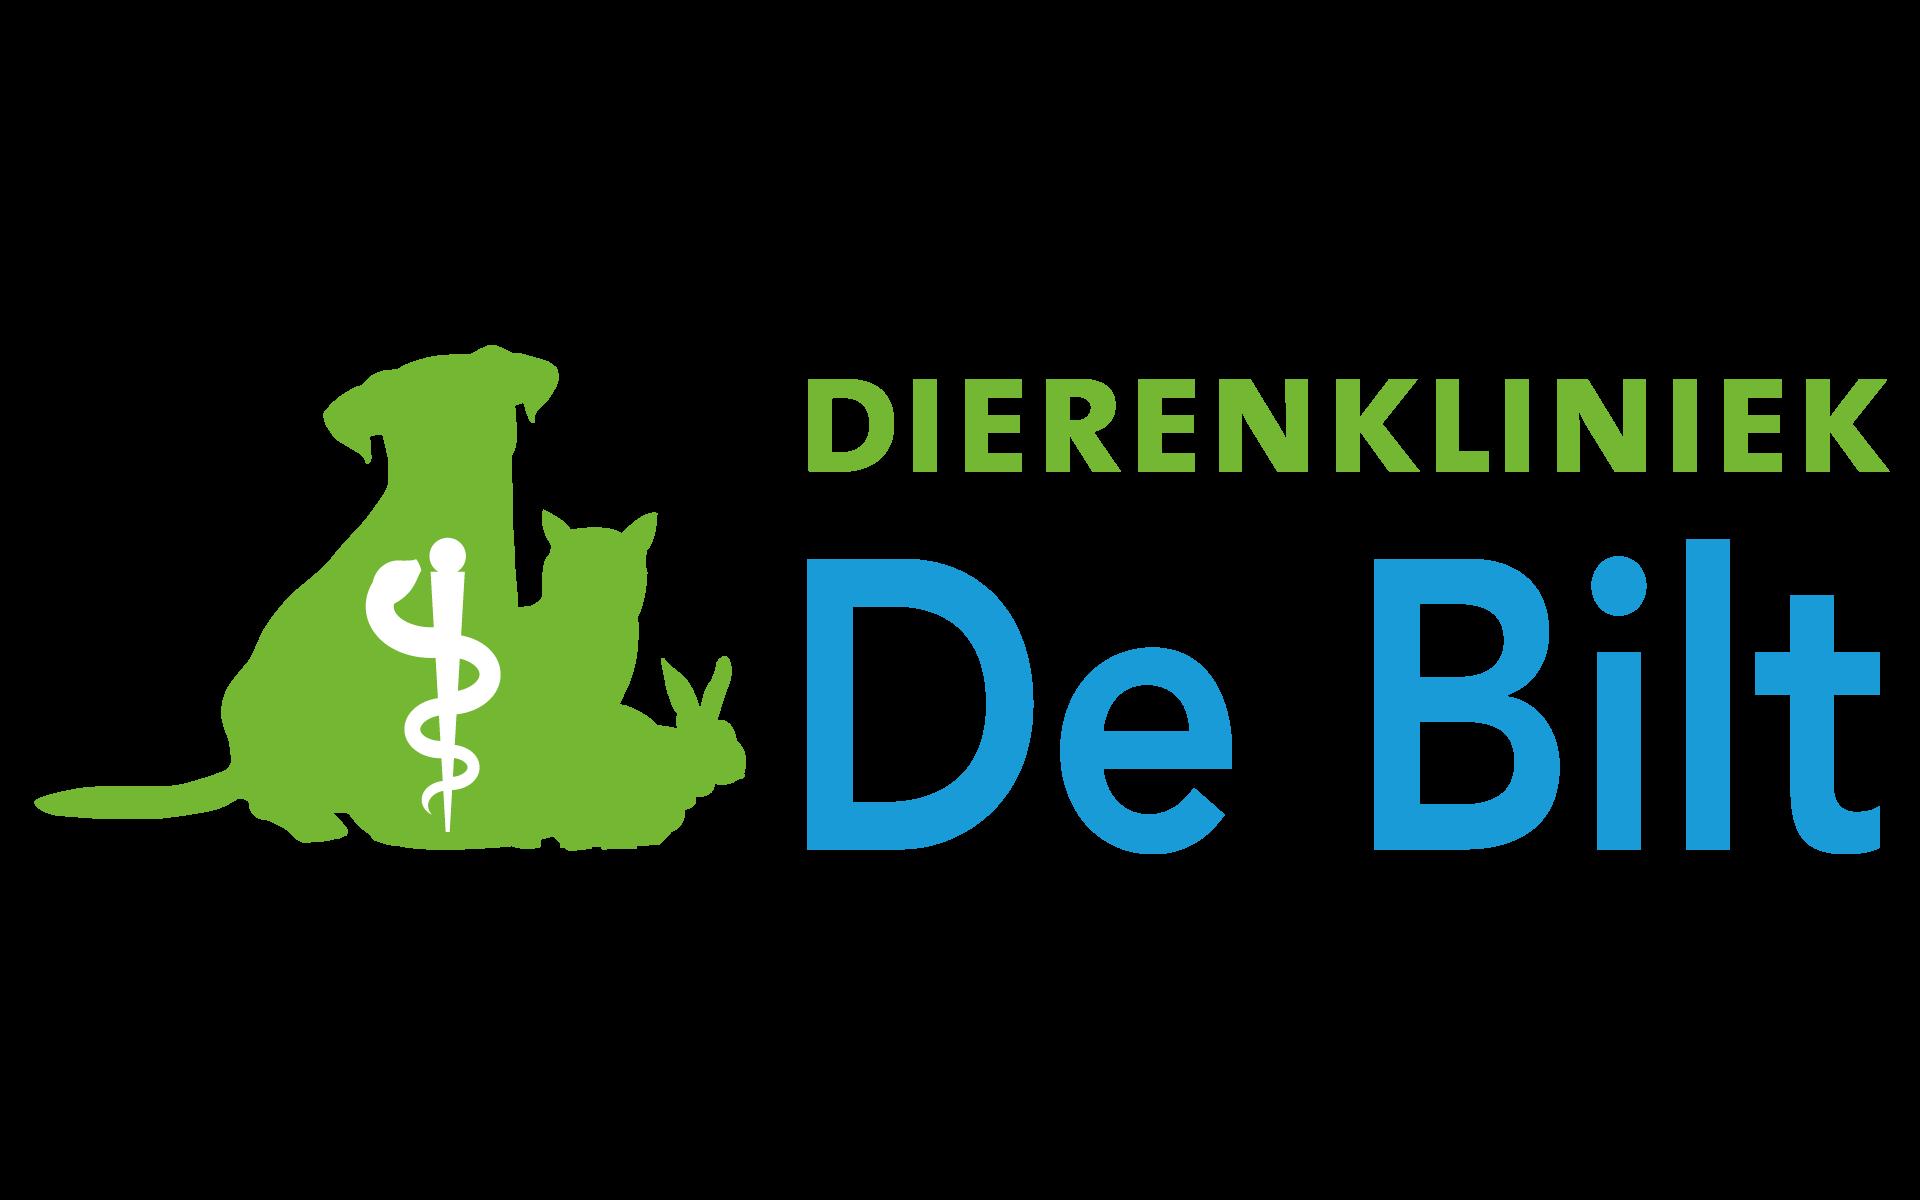 Dierenkliniek De Bilt